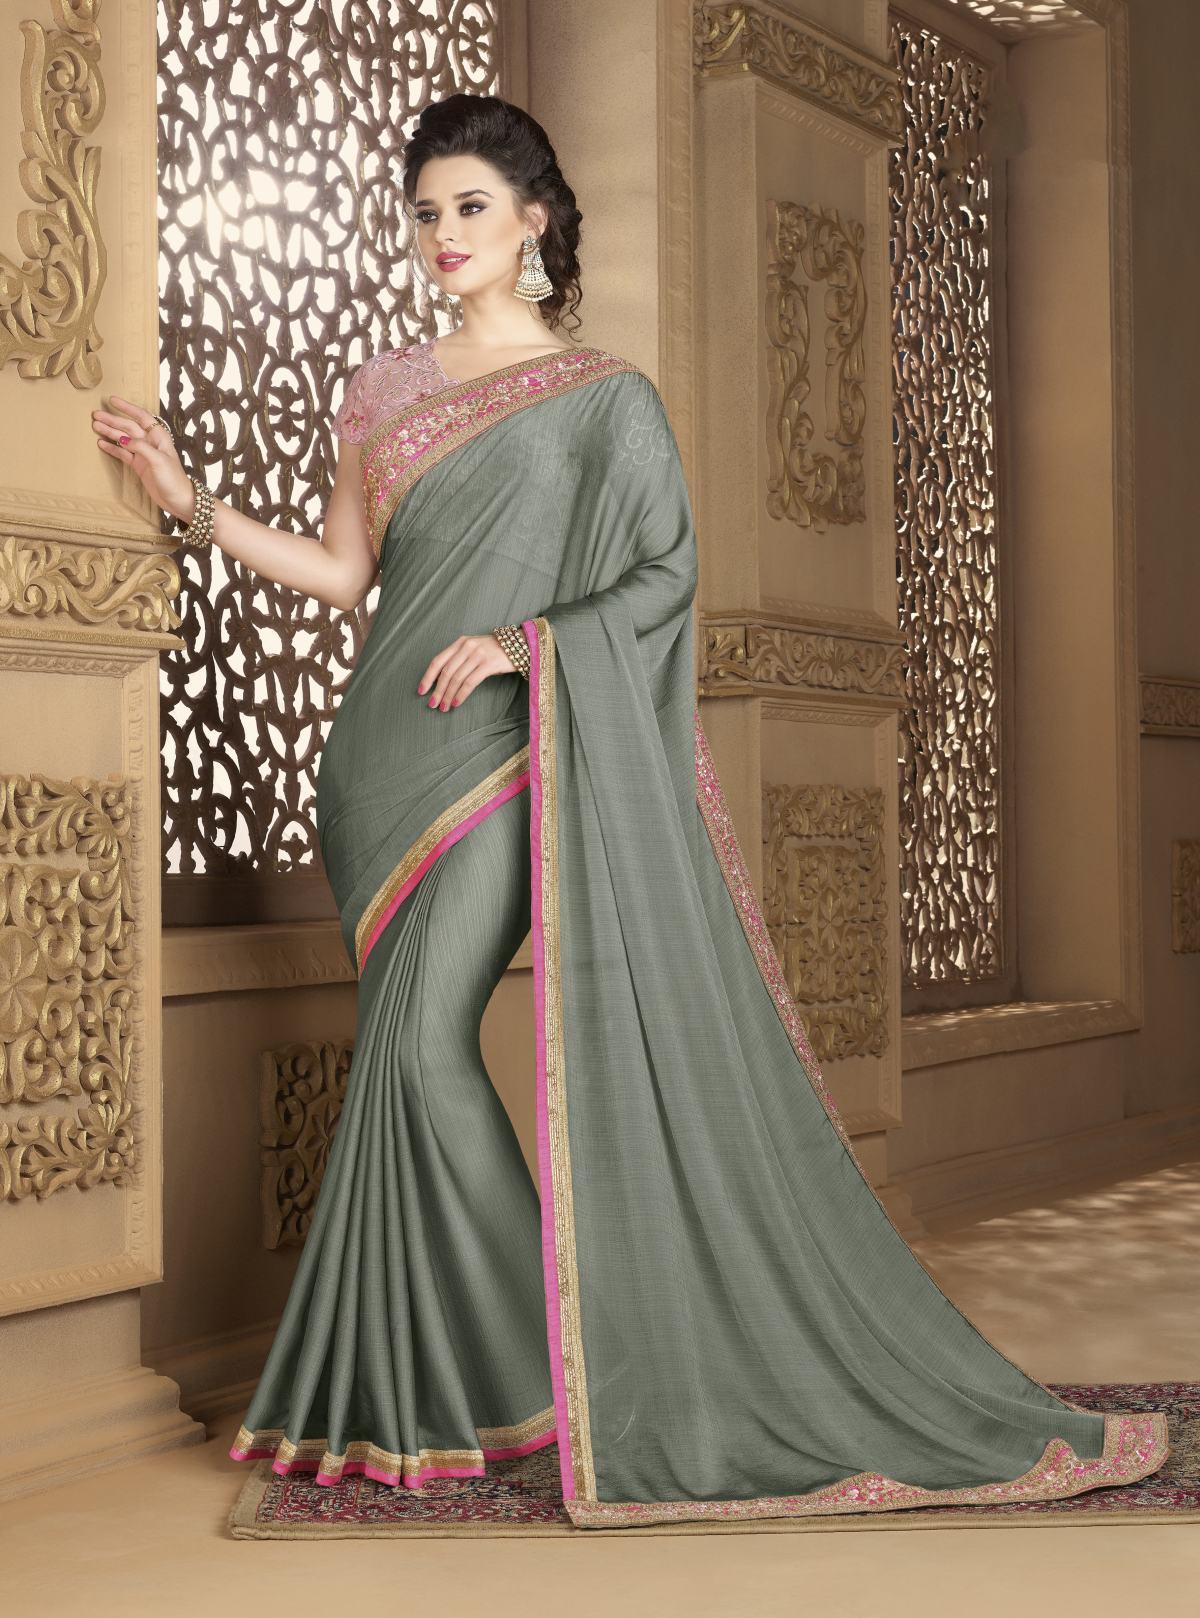 Embroidered Chiffon Saree (Sari) in Gray